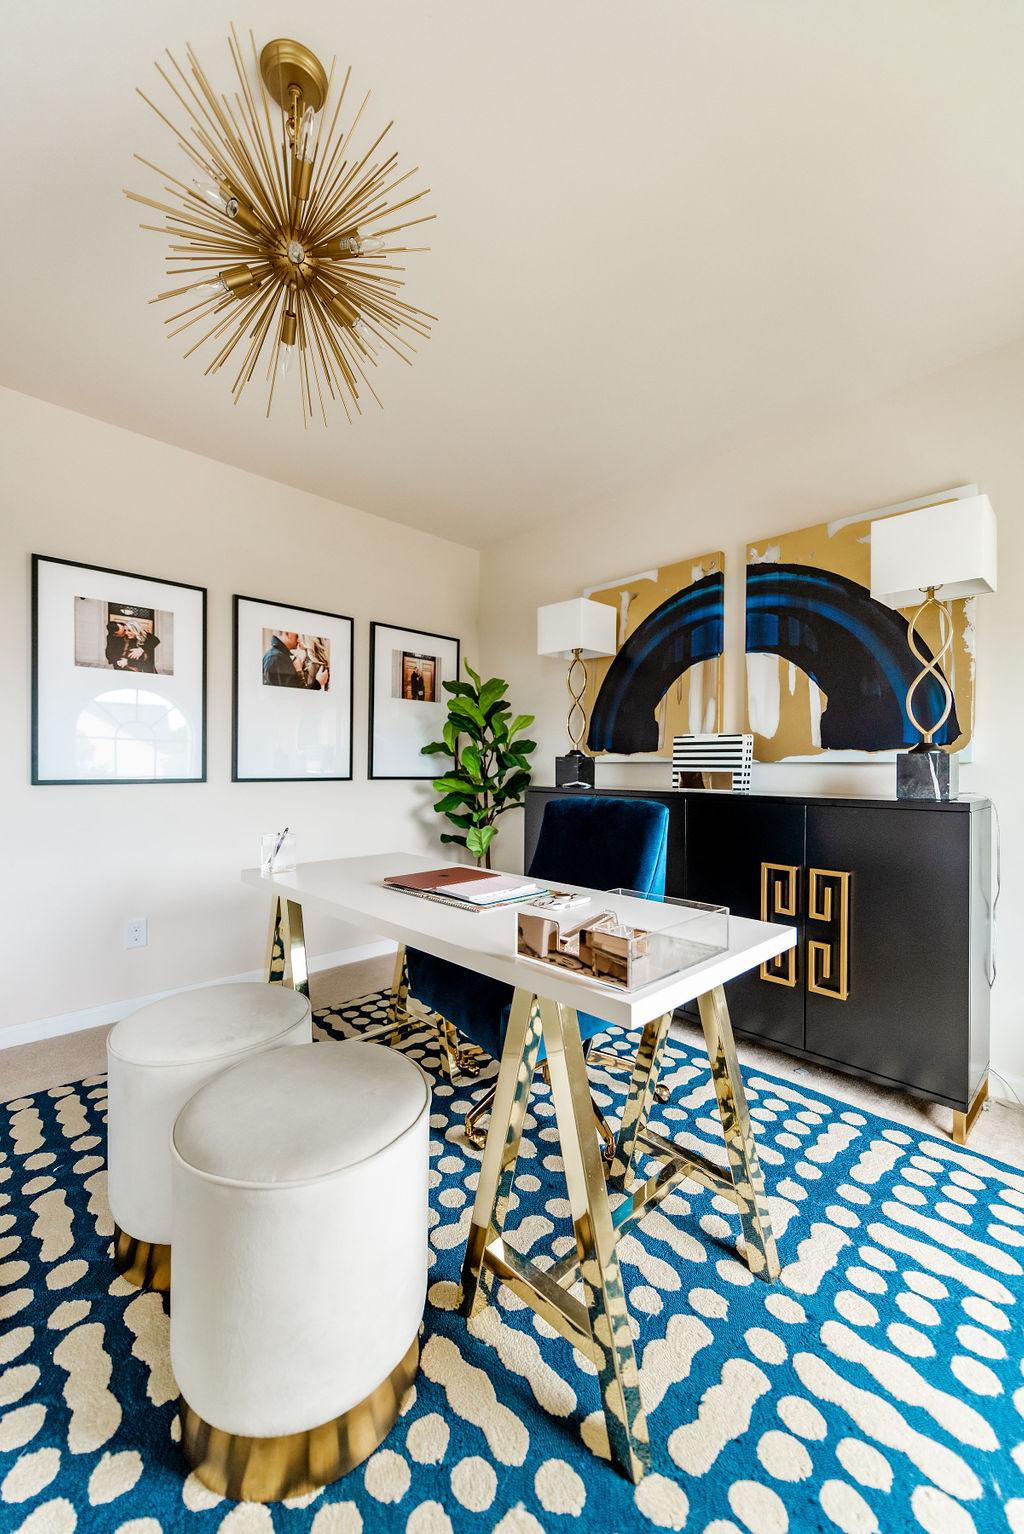 The Cheeky Been Jonathan Adler Inspired Blogger Home Office